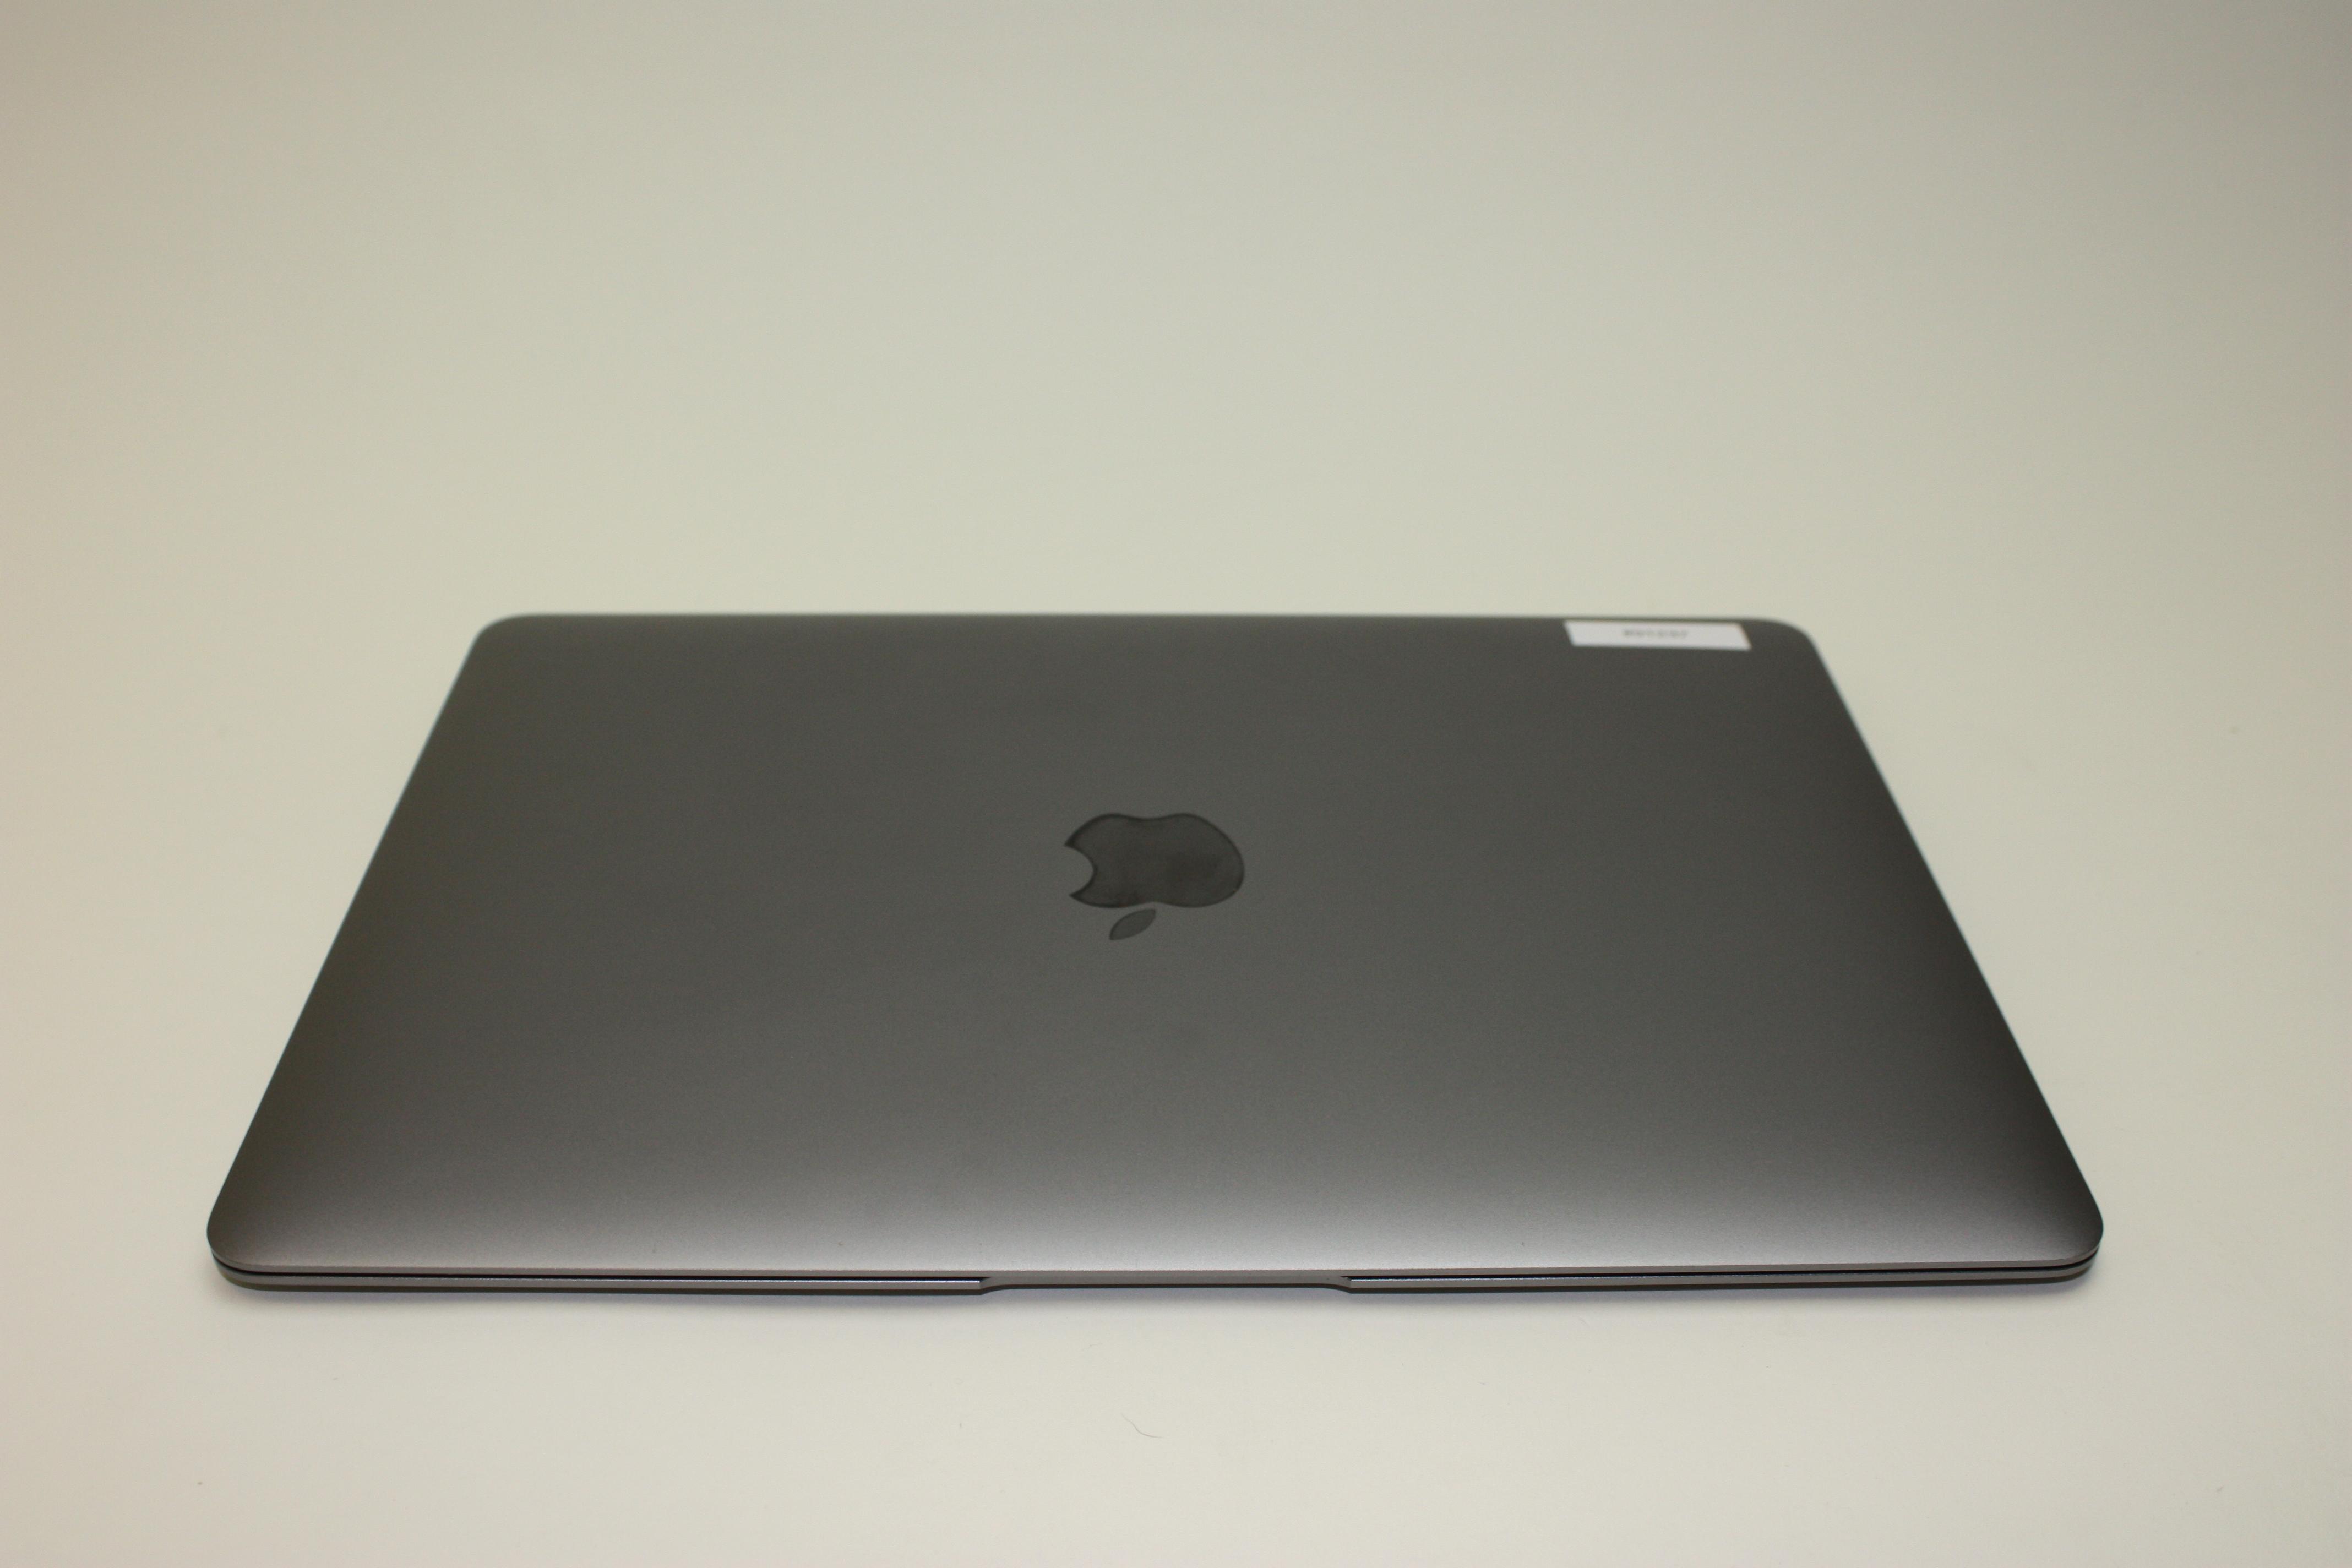 MacBook 12-inch Retina, 1.3 GHz Core M (M-5Y71), 8 GB 1867 MHz DDR3, 256 GB Flash Storage, image 4